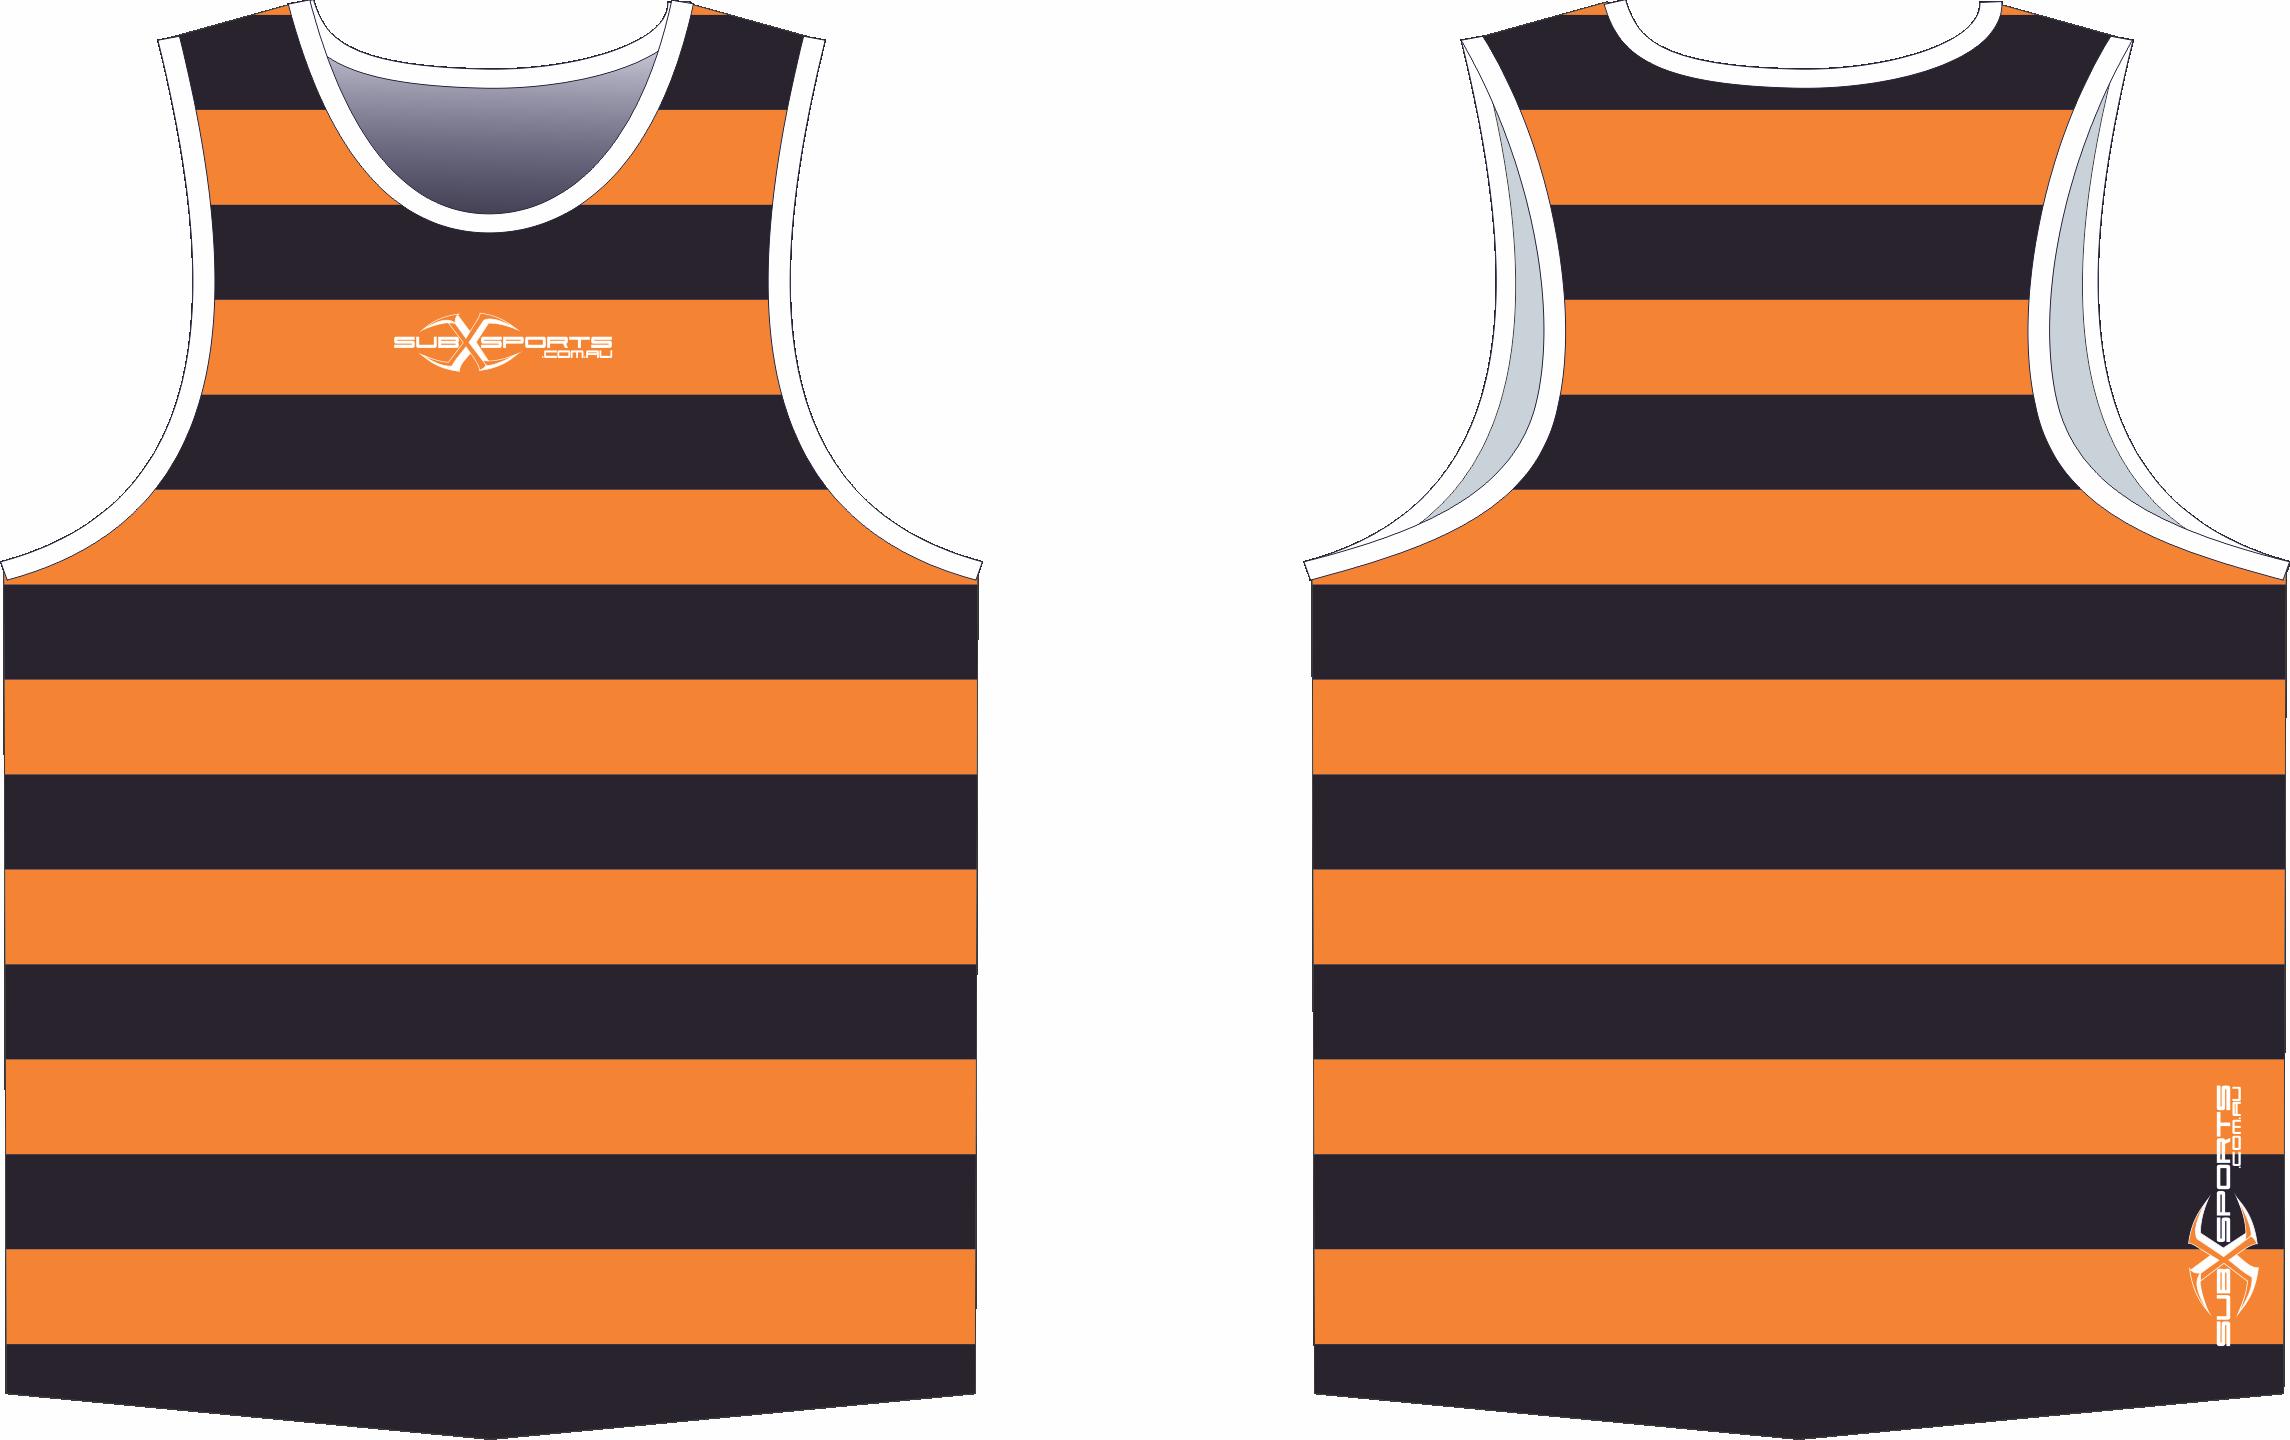 S202XS SingletBlack Orange White.png